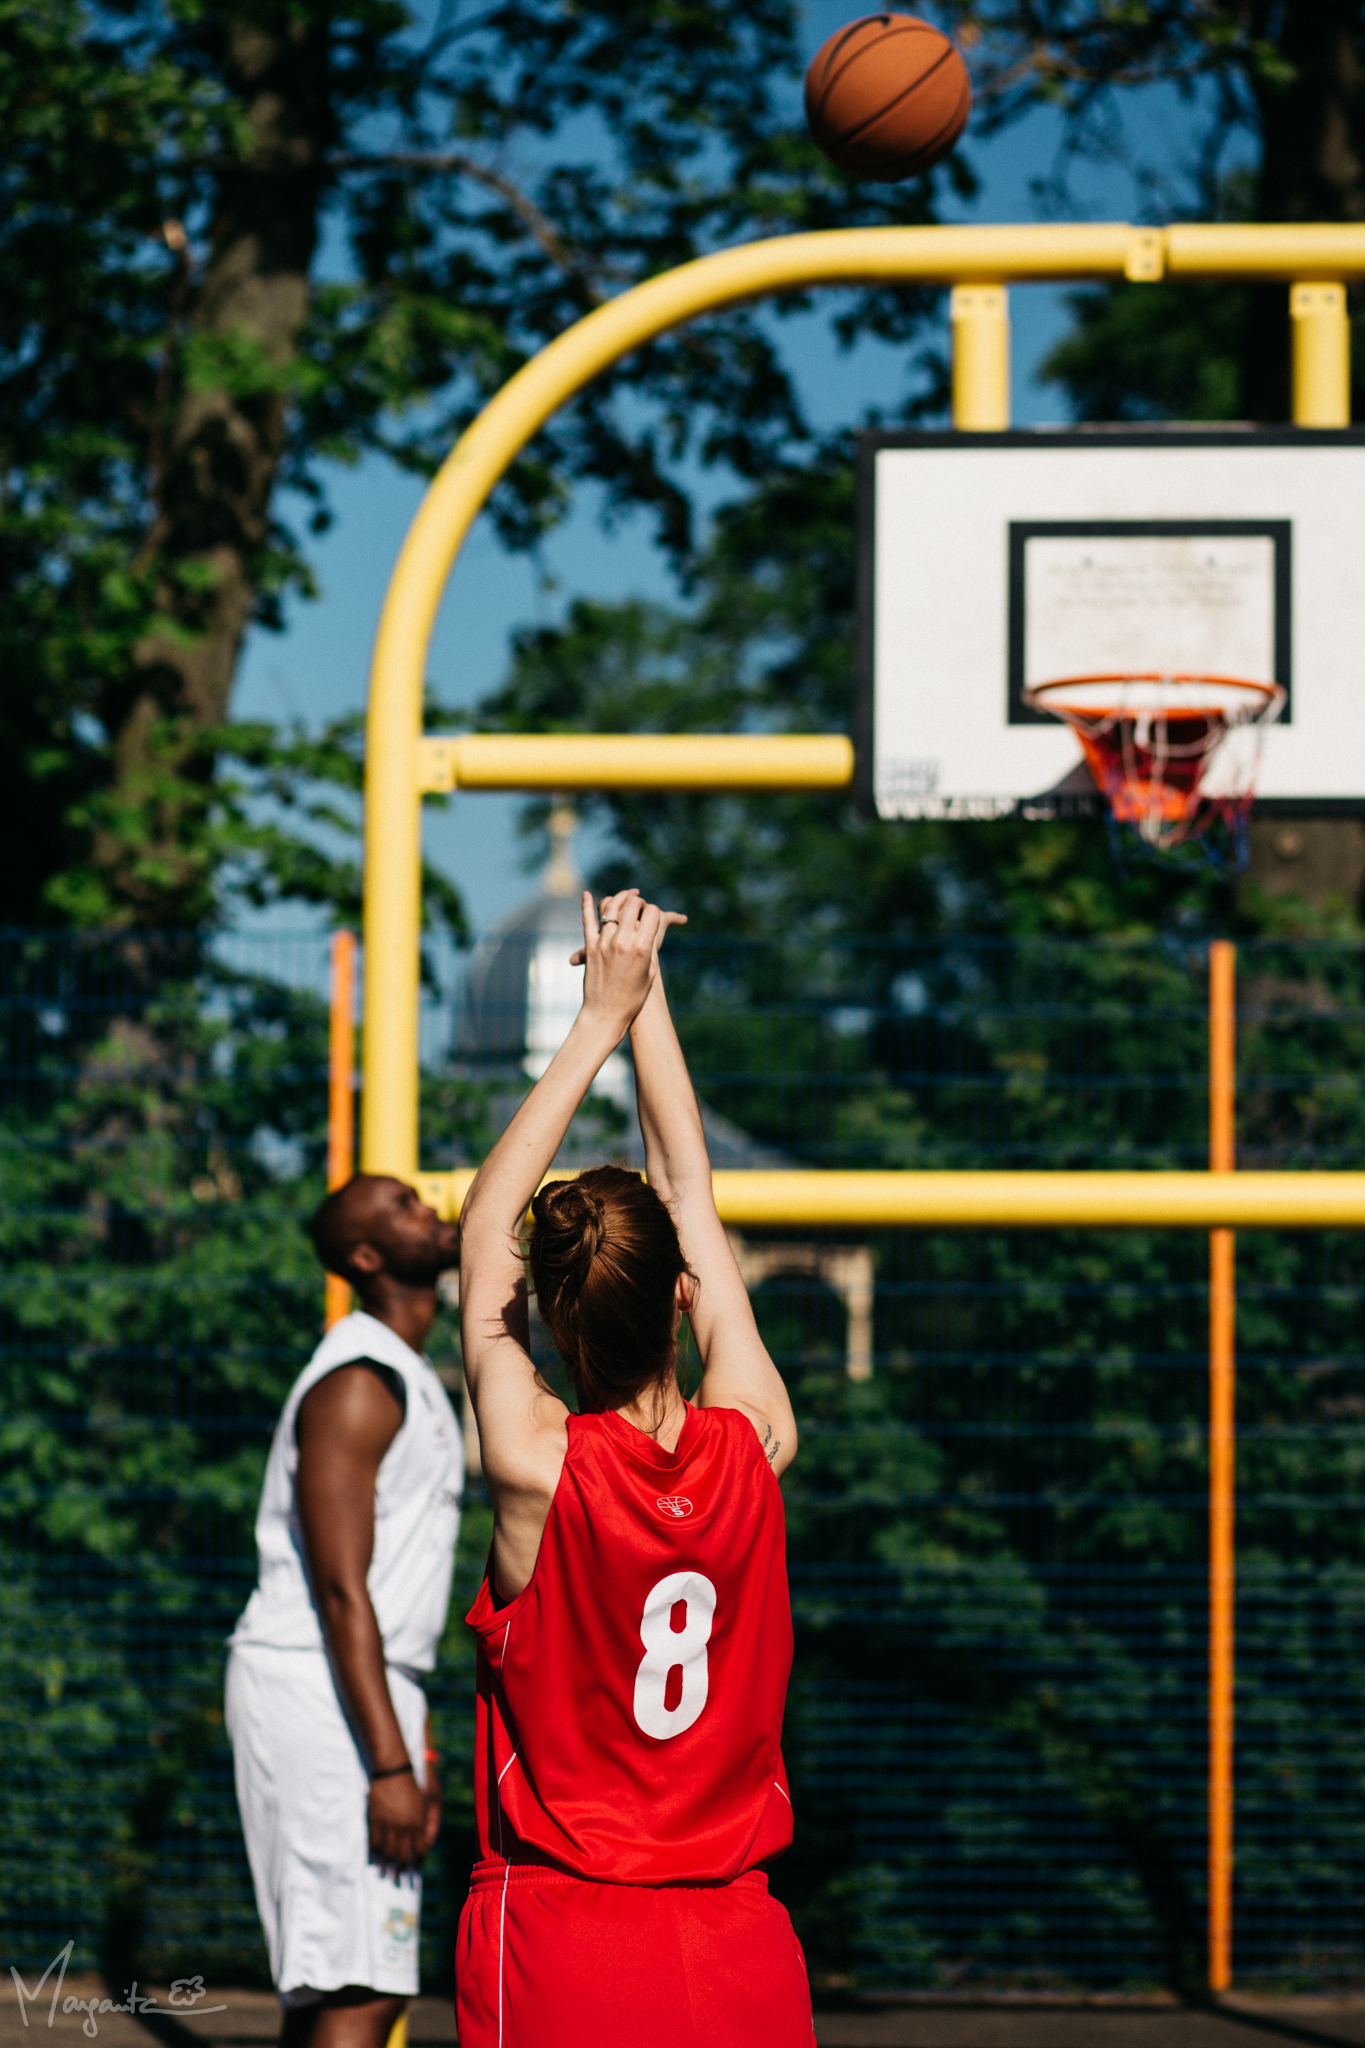 Basketball Engagement Photoshoot, Basketball Engagement Photos, Basketball Engagement,Basketball Couple, Sports Engagement, International Couple, Sporty Couple, Newcastle Upon Tyne Photographer, Newcastle Photographer, Northumberland Photographer, Margarita G Photography